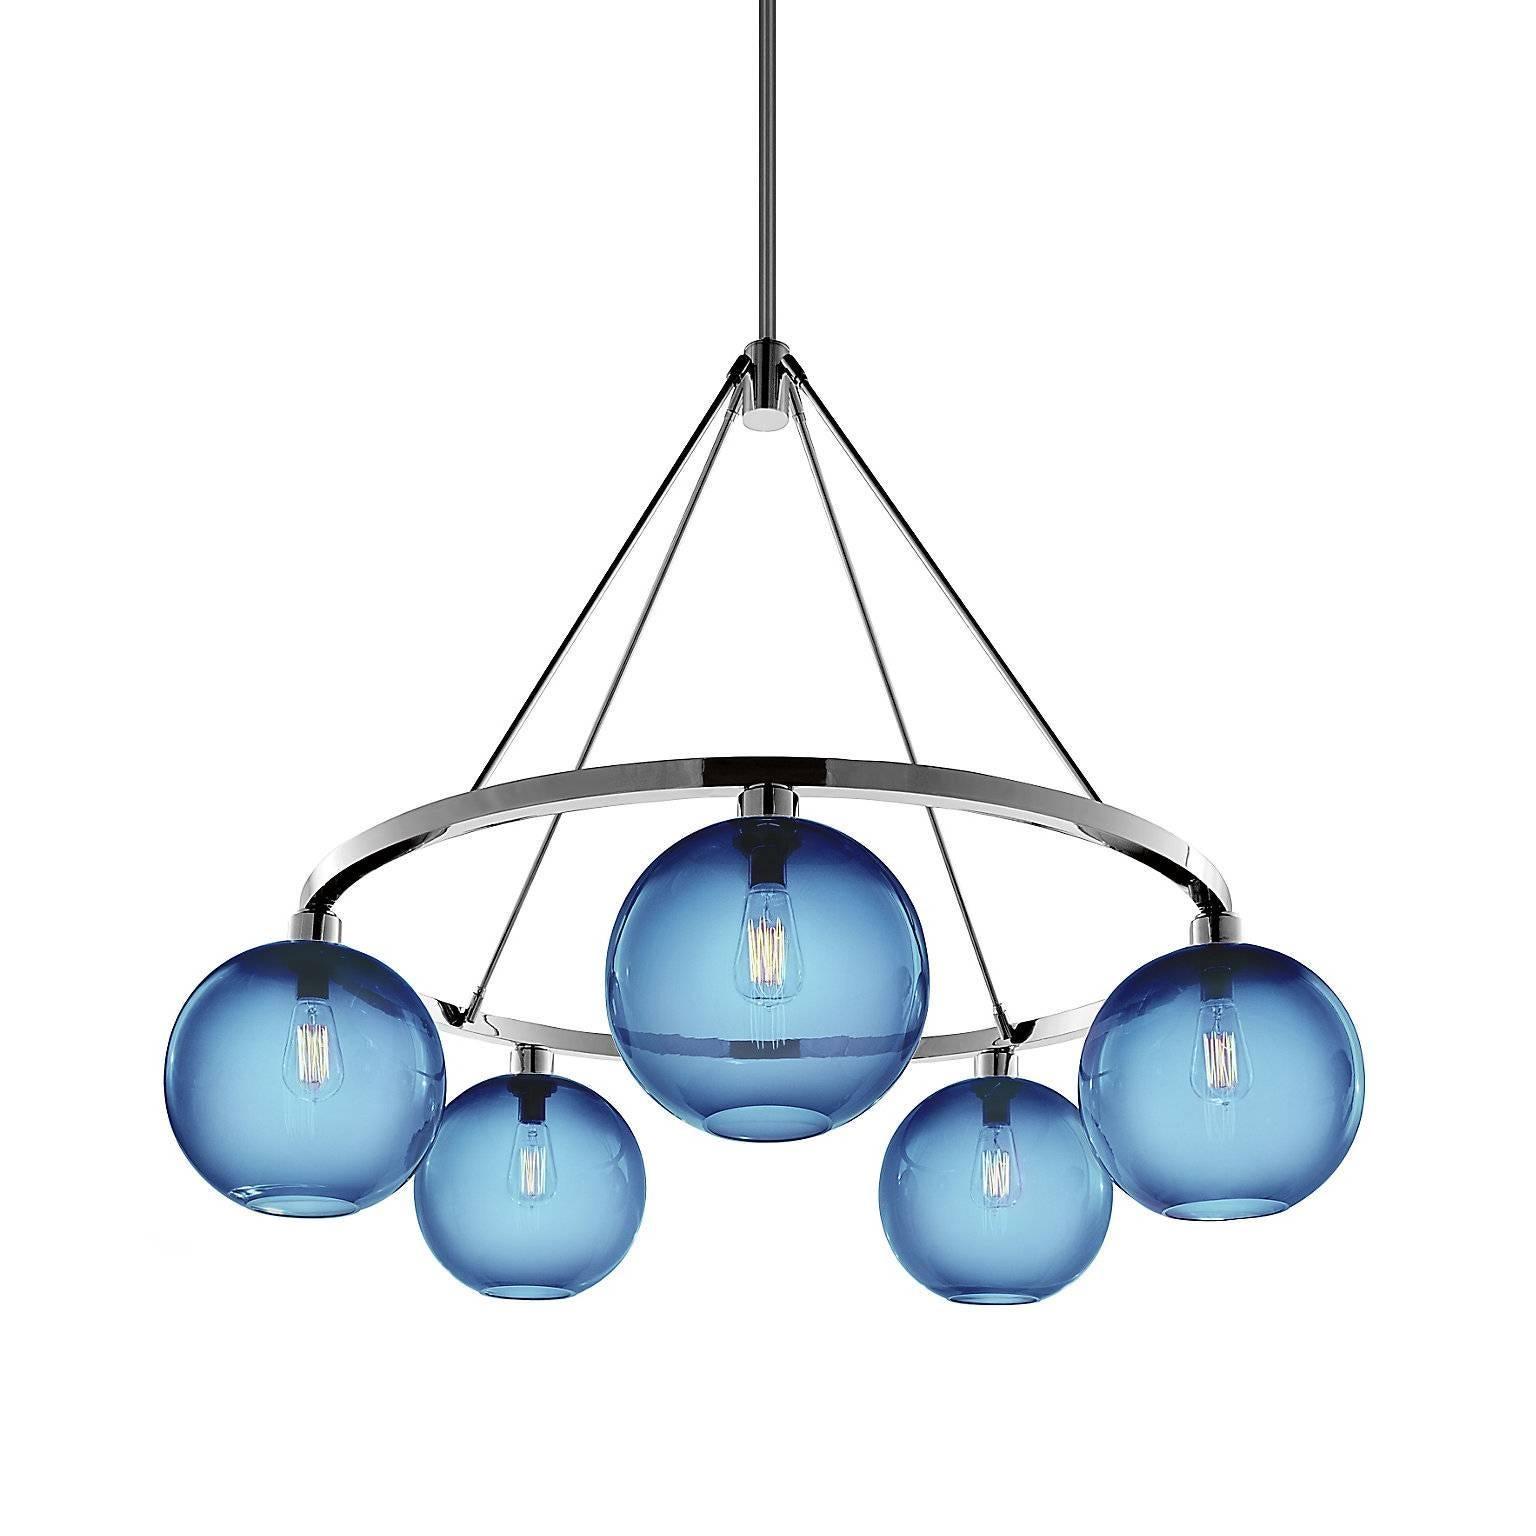 Solitaire Sapphire Handblown Modern Glass Polished Nickel Chandelier Light